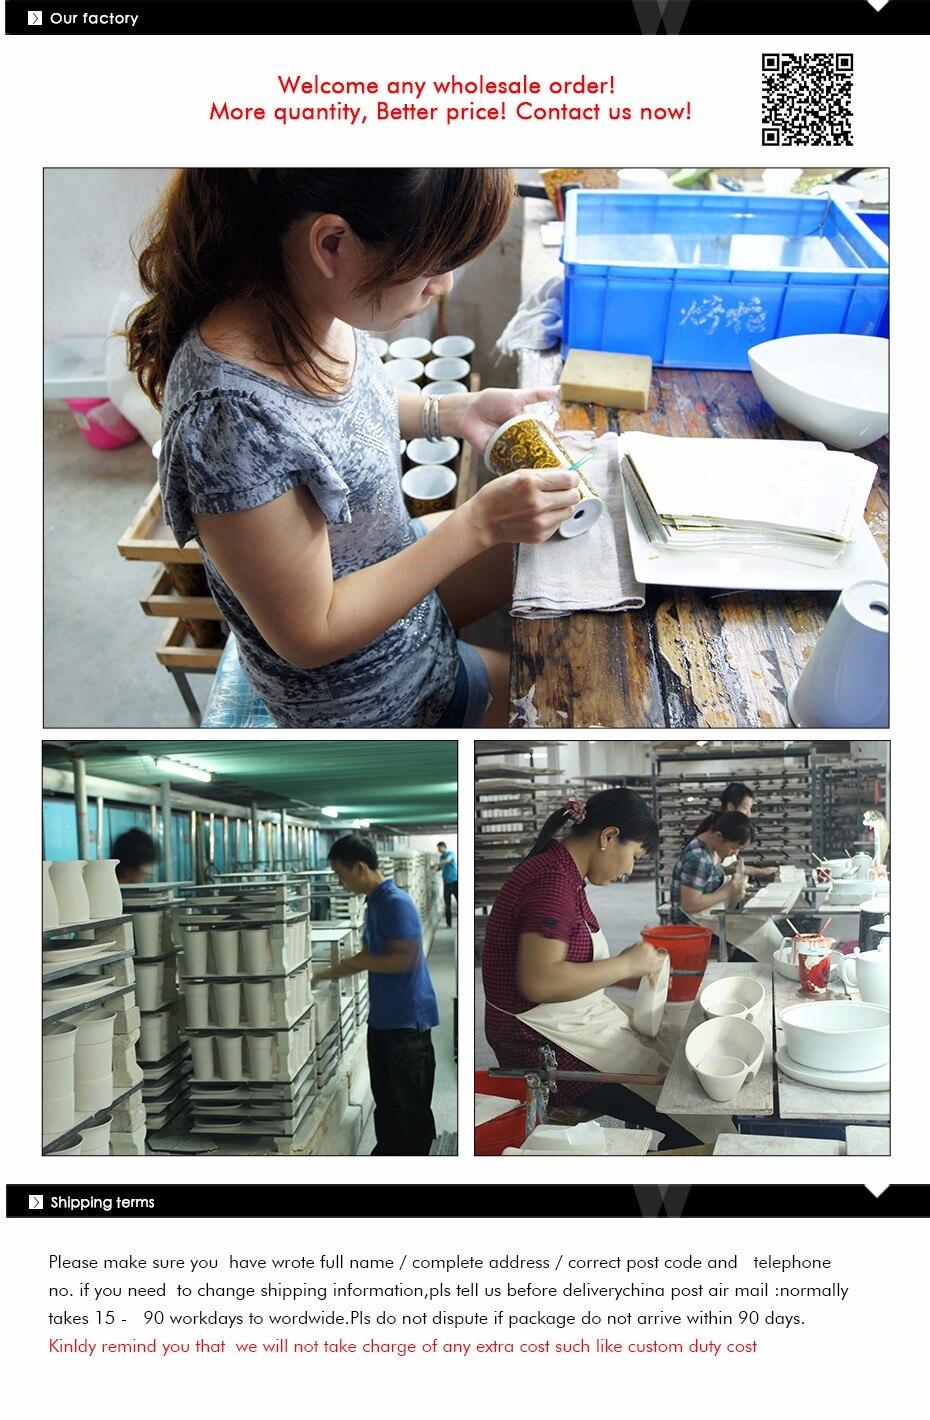 4 Pcs Jalur Desain Keramik Kamar Mandi Sekongkol Set Kreatif Comport Carpet Karpet Mercy Cls400 Premium 2cm 01 02 03 04